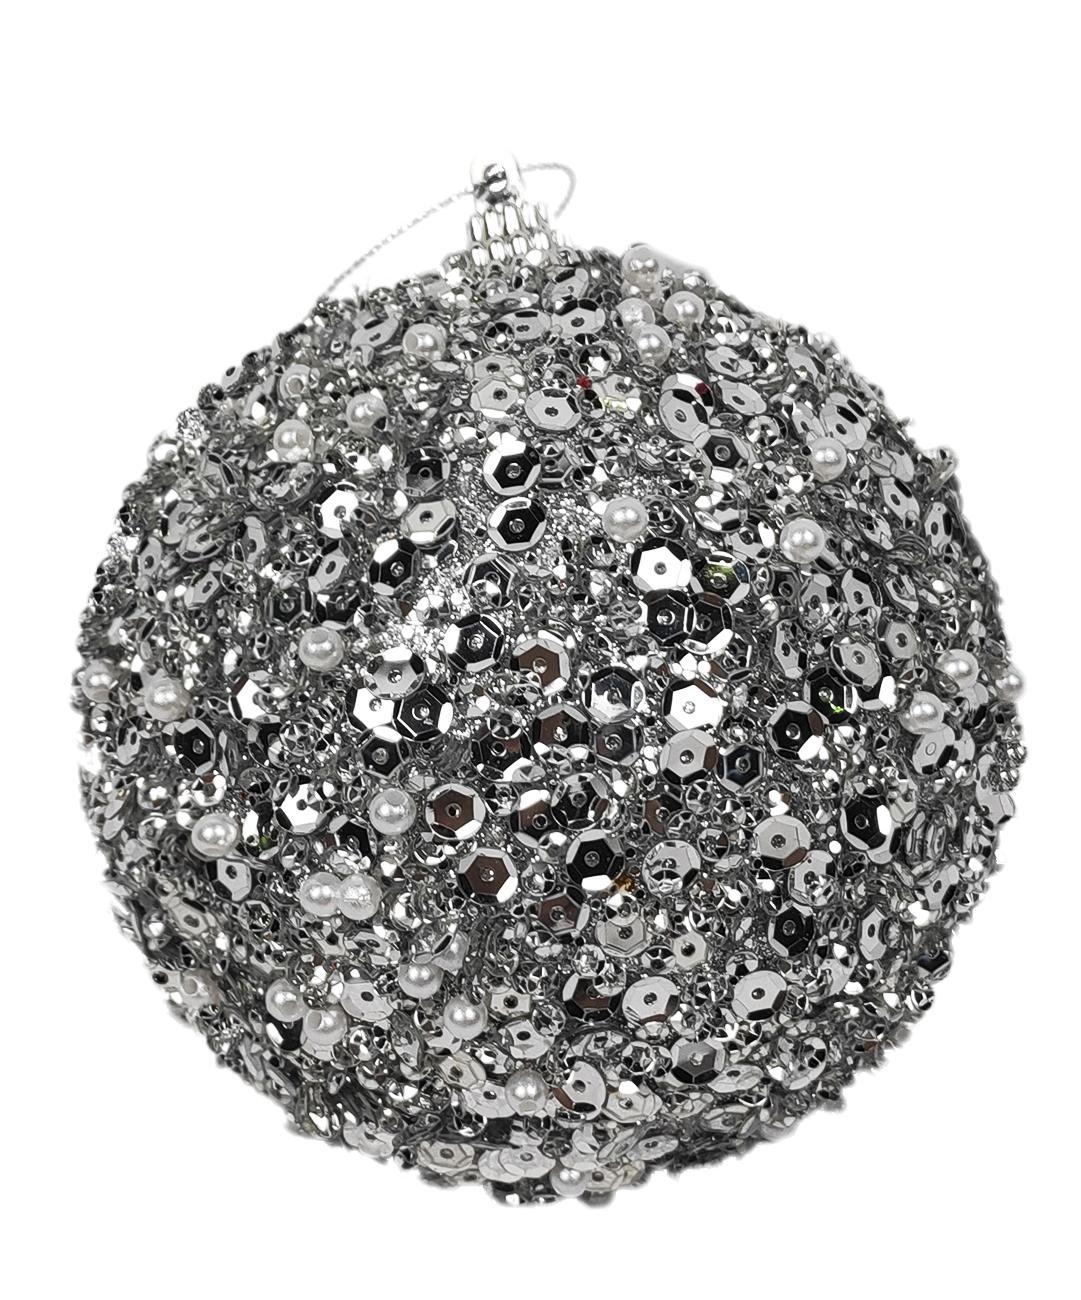 Ёлочная игрушка Jewel Night BC-580 8 см, 3 штуки